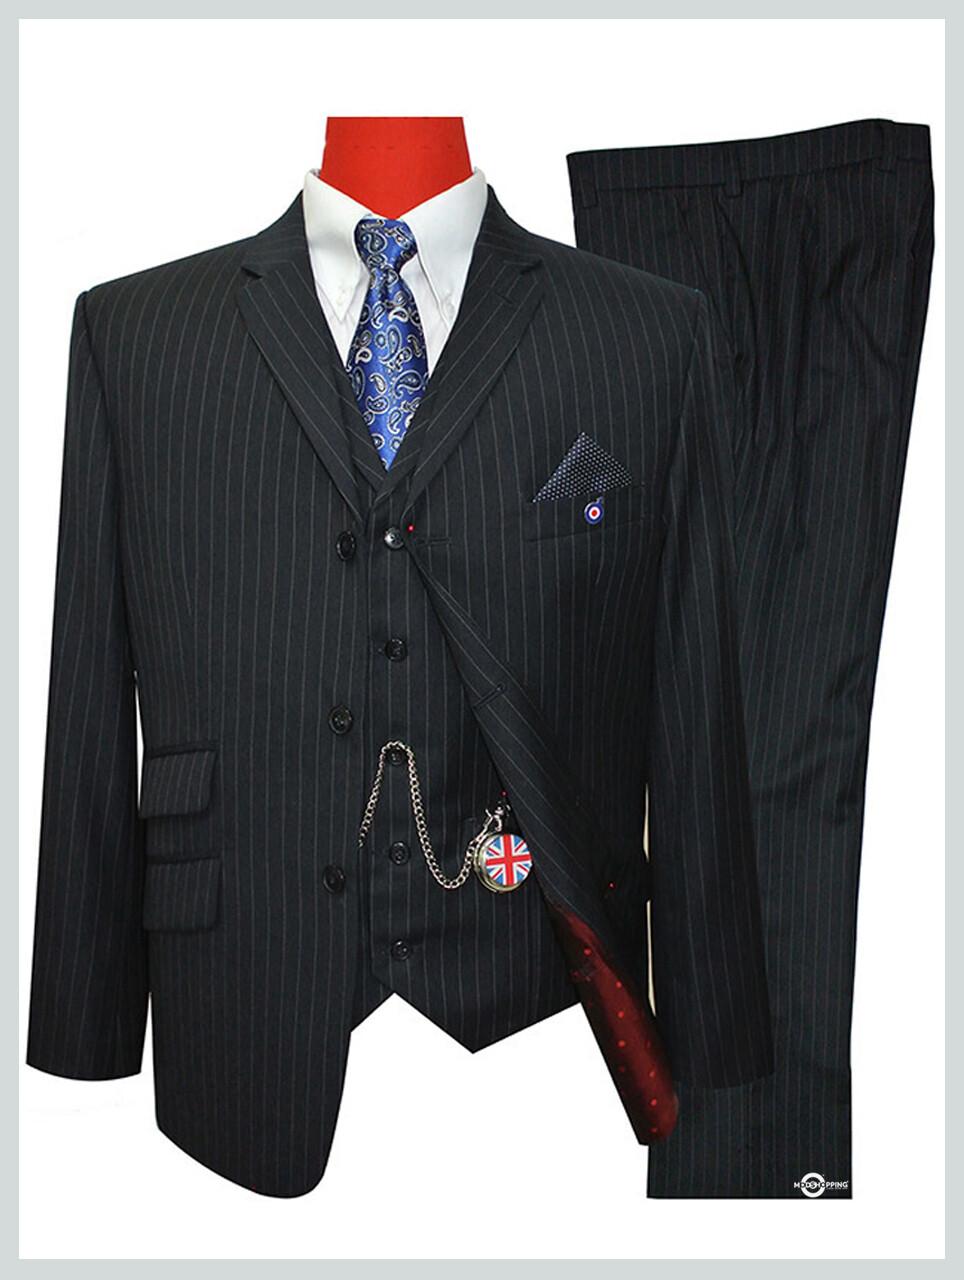 Pinstripe Suit| Classic Black Pin Stripe Three Piece Suit 60s Mod Style Tailored